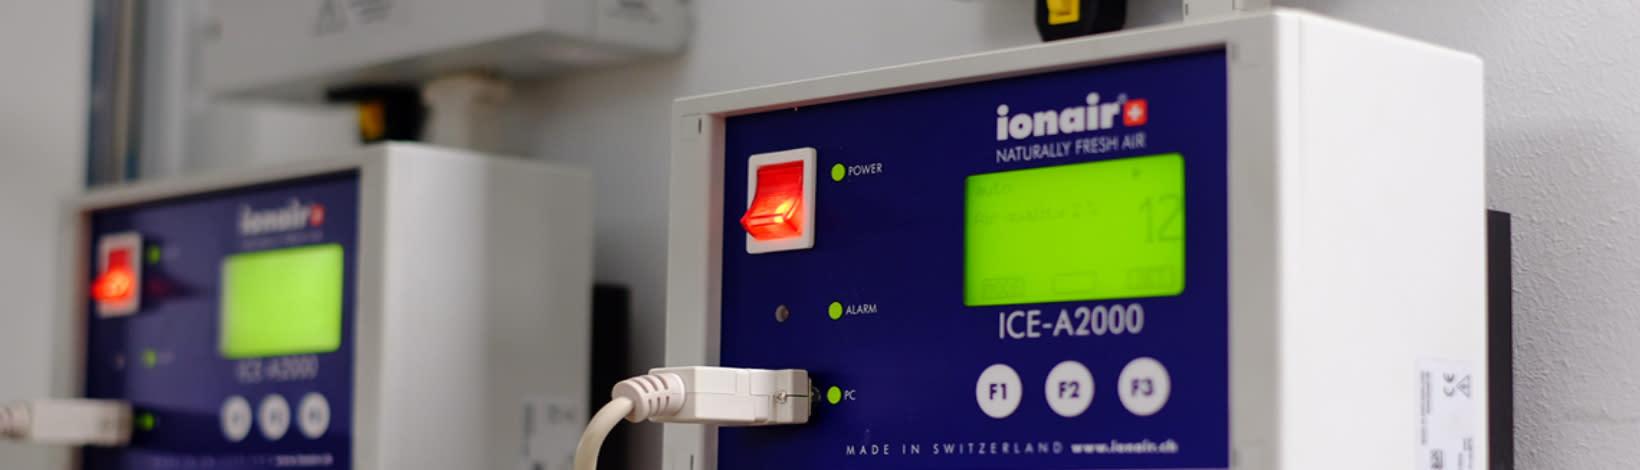 ionair unit